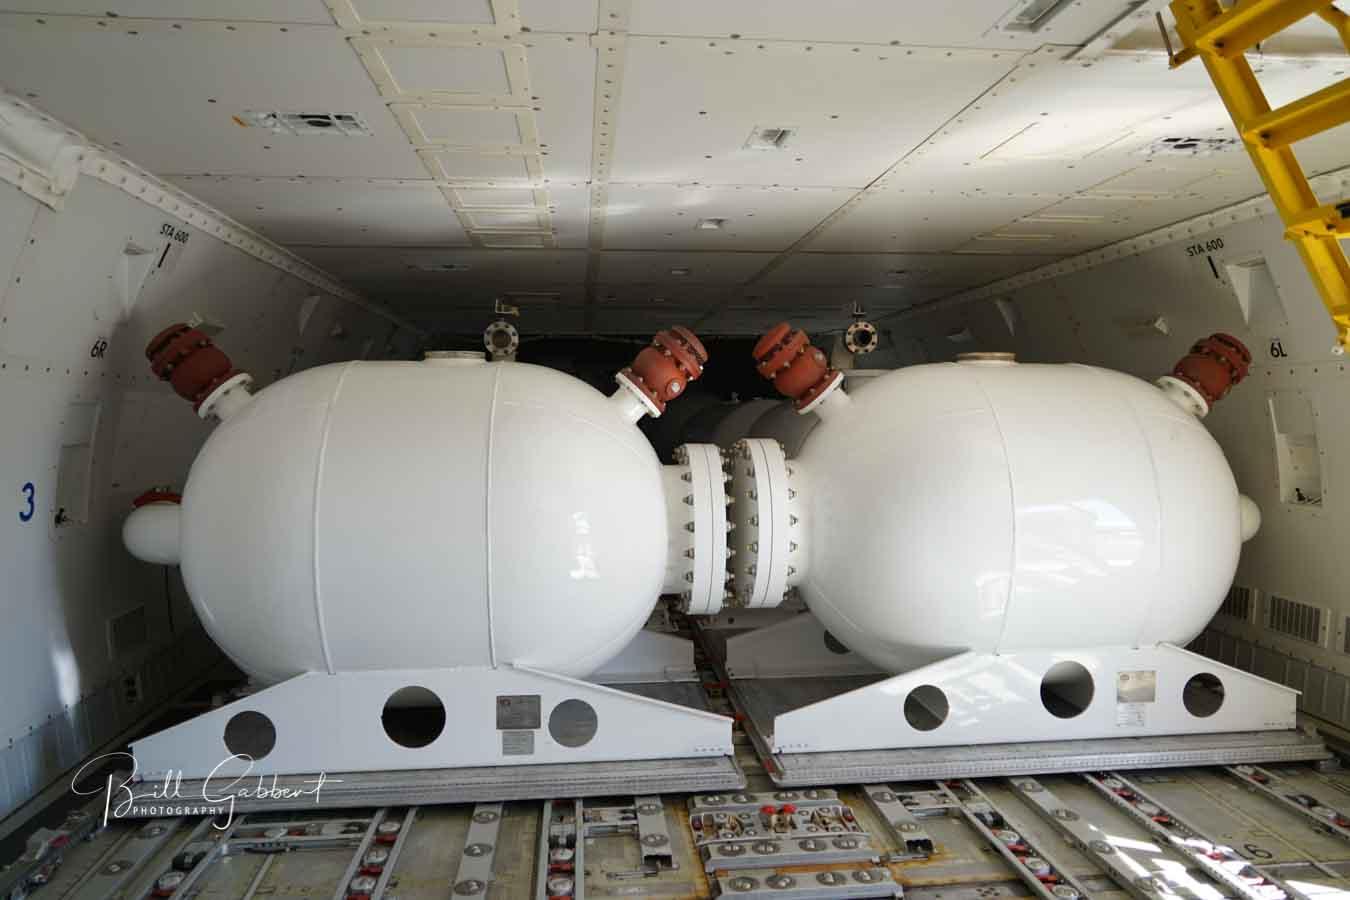 747 Supertanker tanks